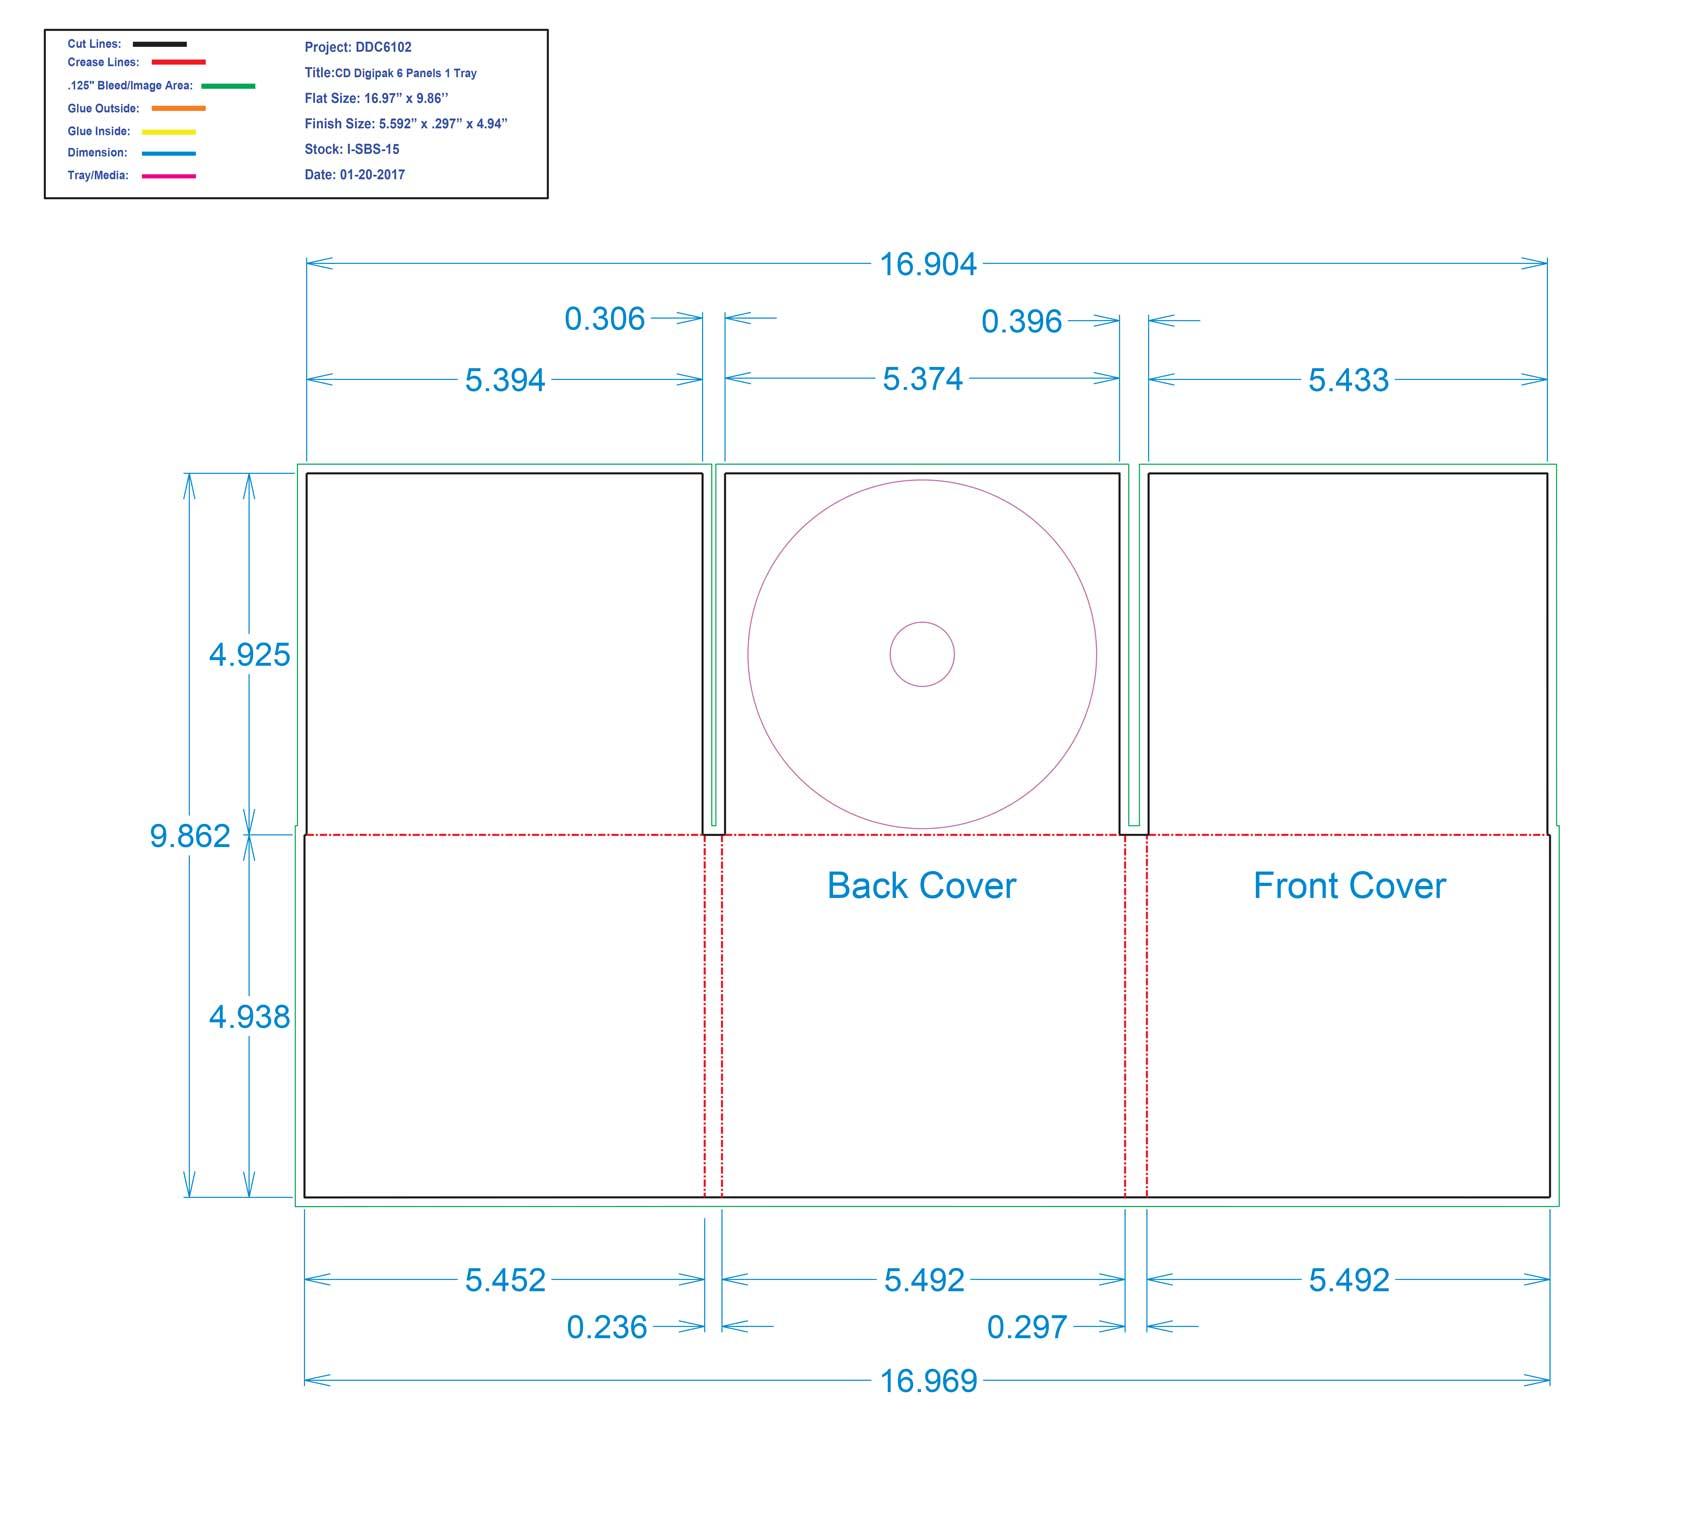 DDC6102 - 6 Panel CD Digi One Tray No Pocket